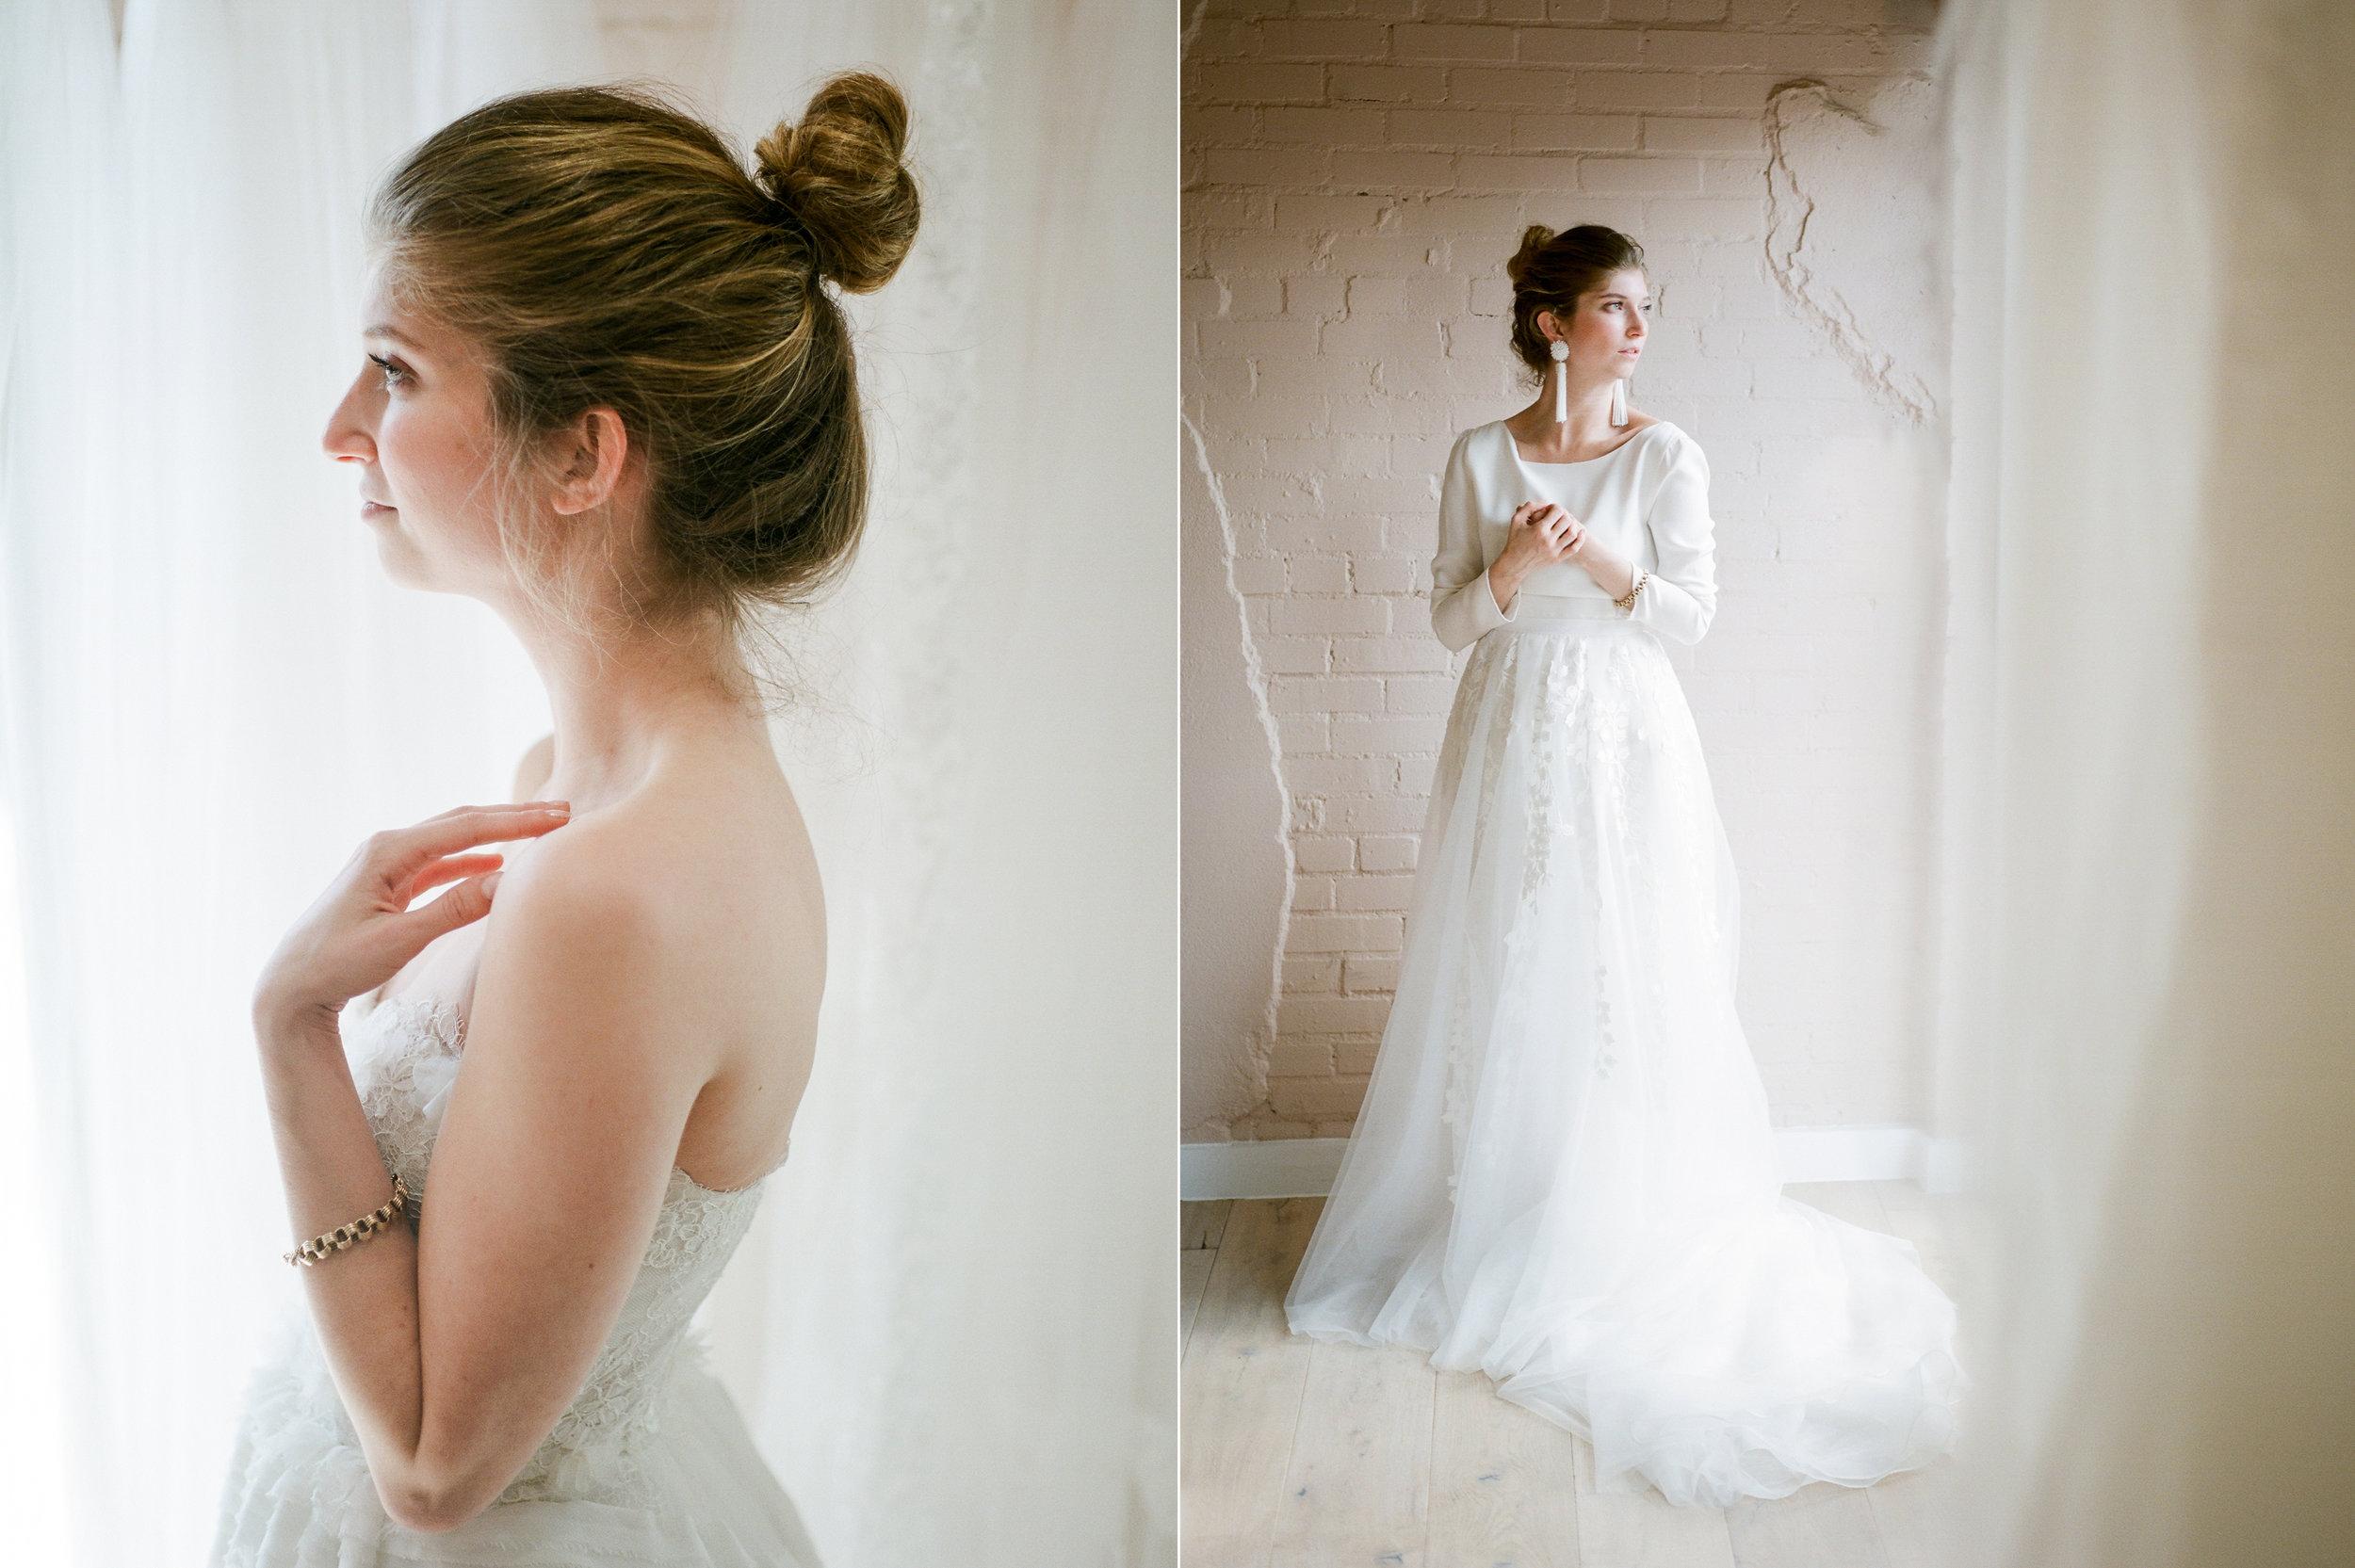 Christine Gosch_Houston wedding photographer_wedding dress styles_Houston wedding boutique_Marchesa wedding dress_ Tara Lauren bridal wedding dress_Alexandra Grecco-7.jpg